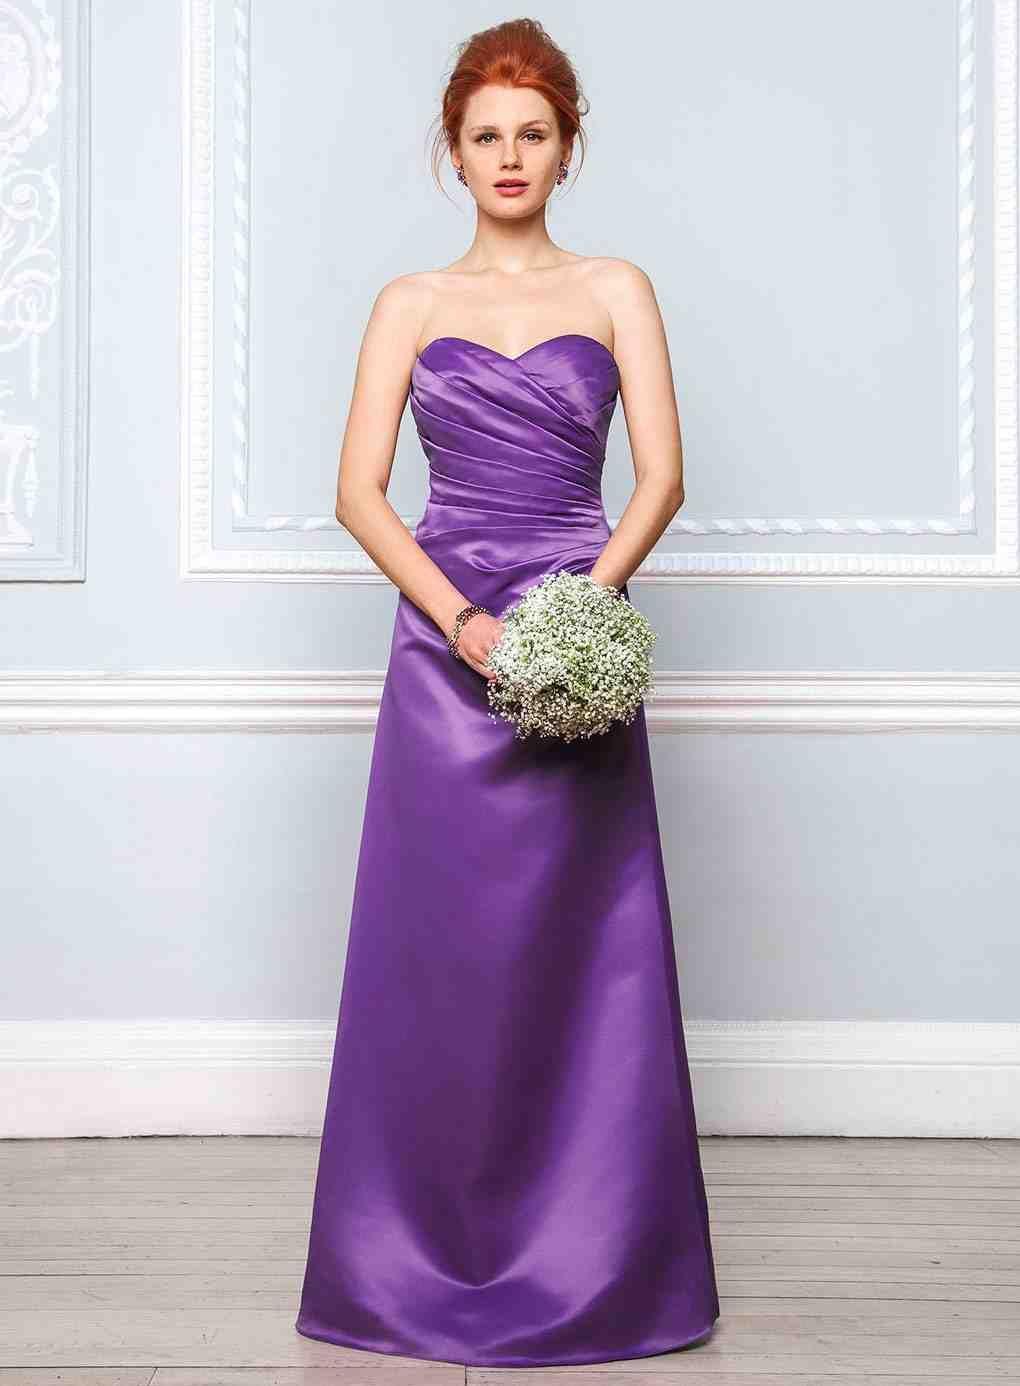 Purple bridesmaid dresses purple bridesmaid dresses pinterest purple bridesmaid dresses ombrellifo Gallery